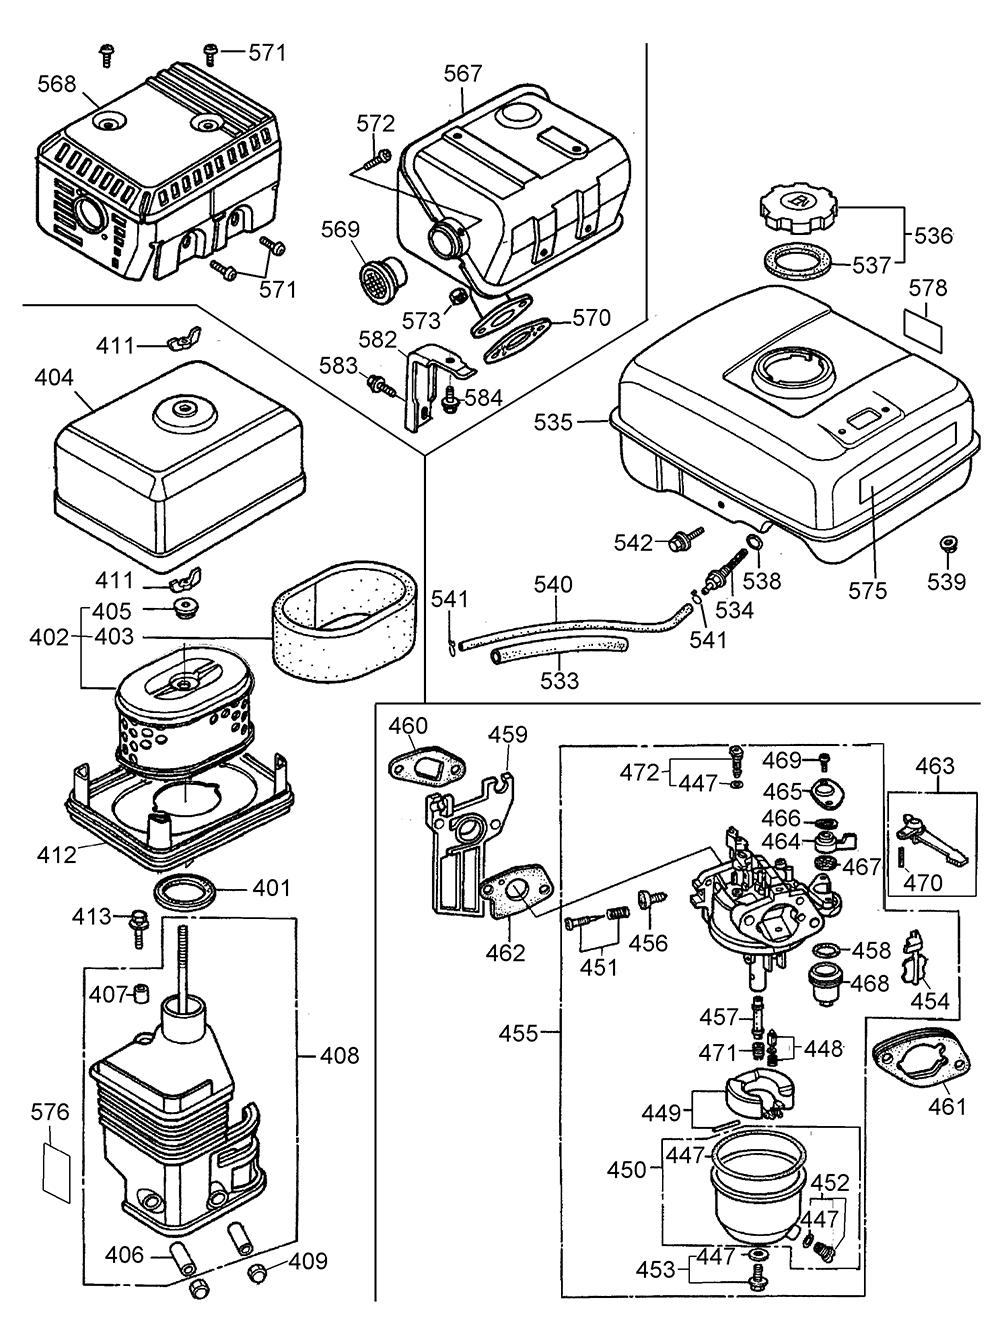 DP3100IC-Dewalt-T2-PB-1Break Down